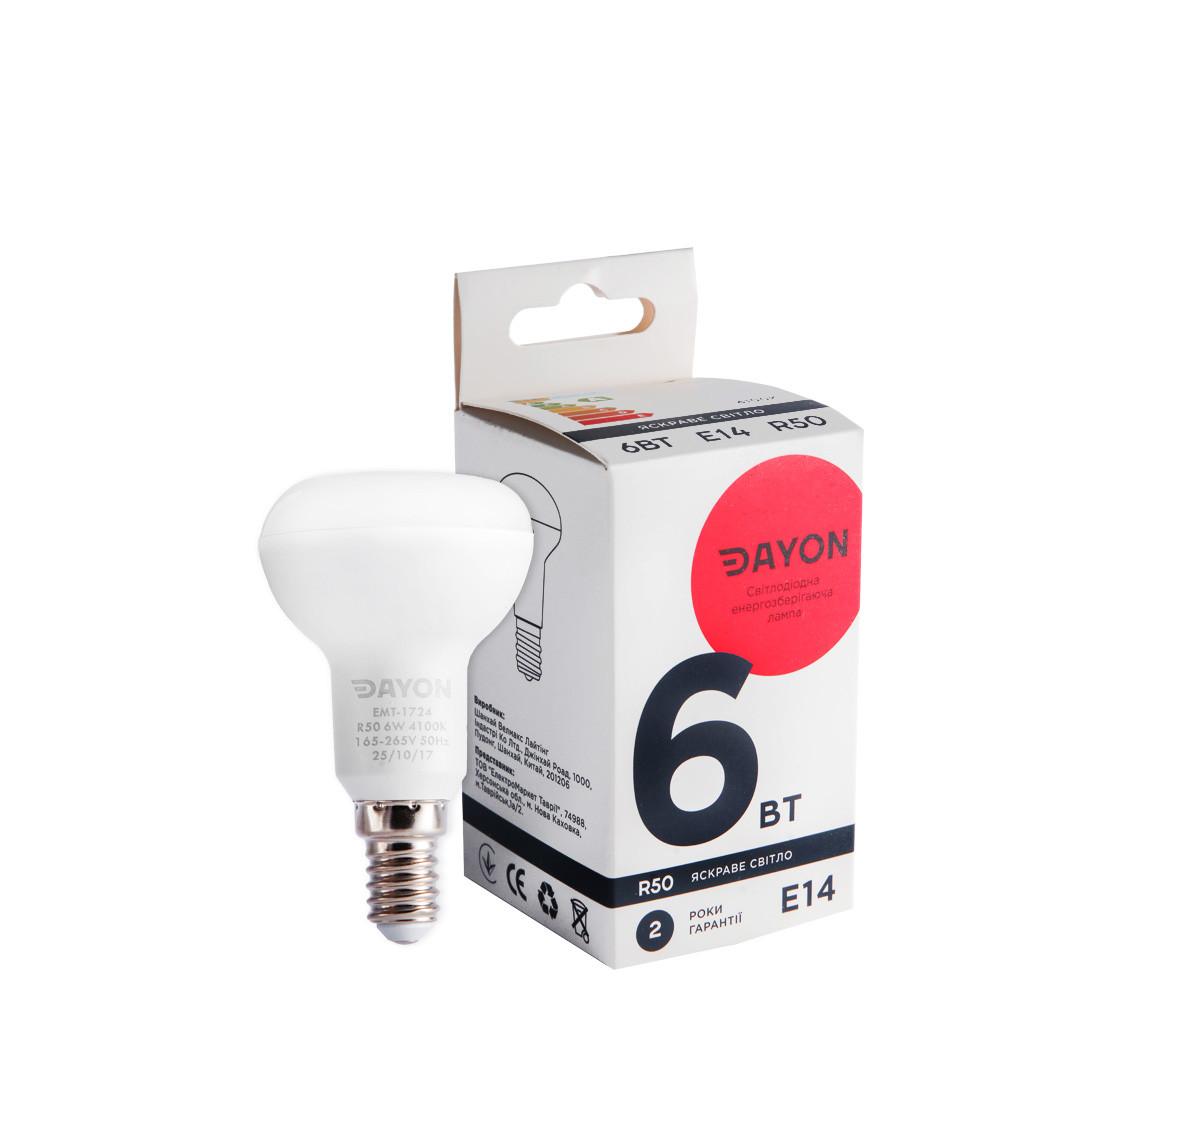 Светодиодная лампа DAYON EMT-1724 R50 6W 4100K E14